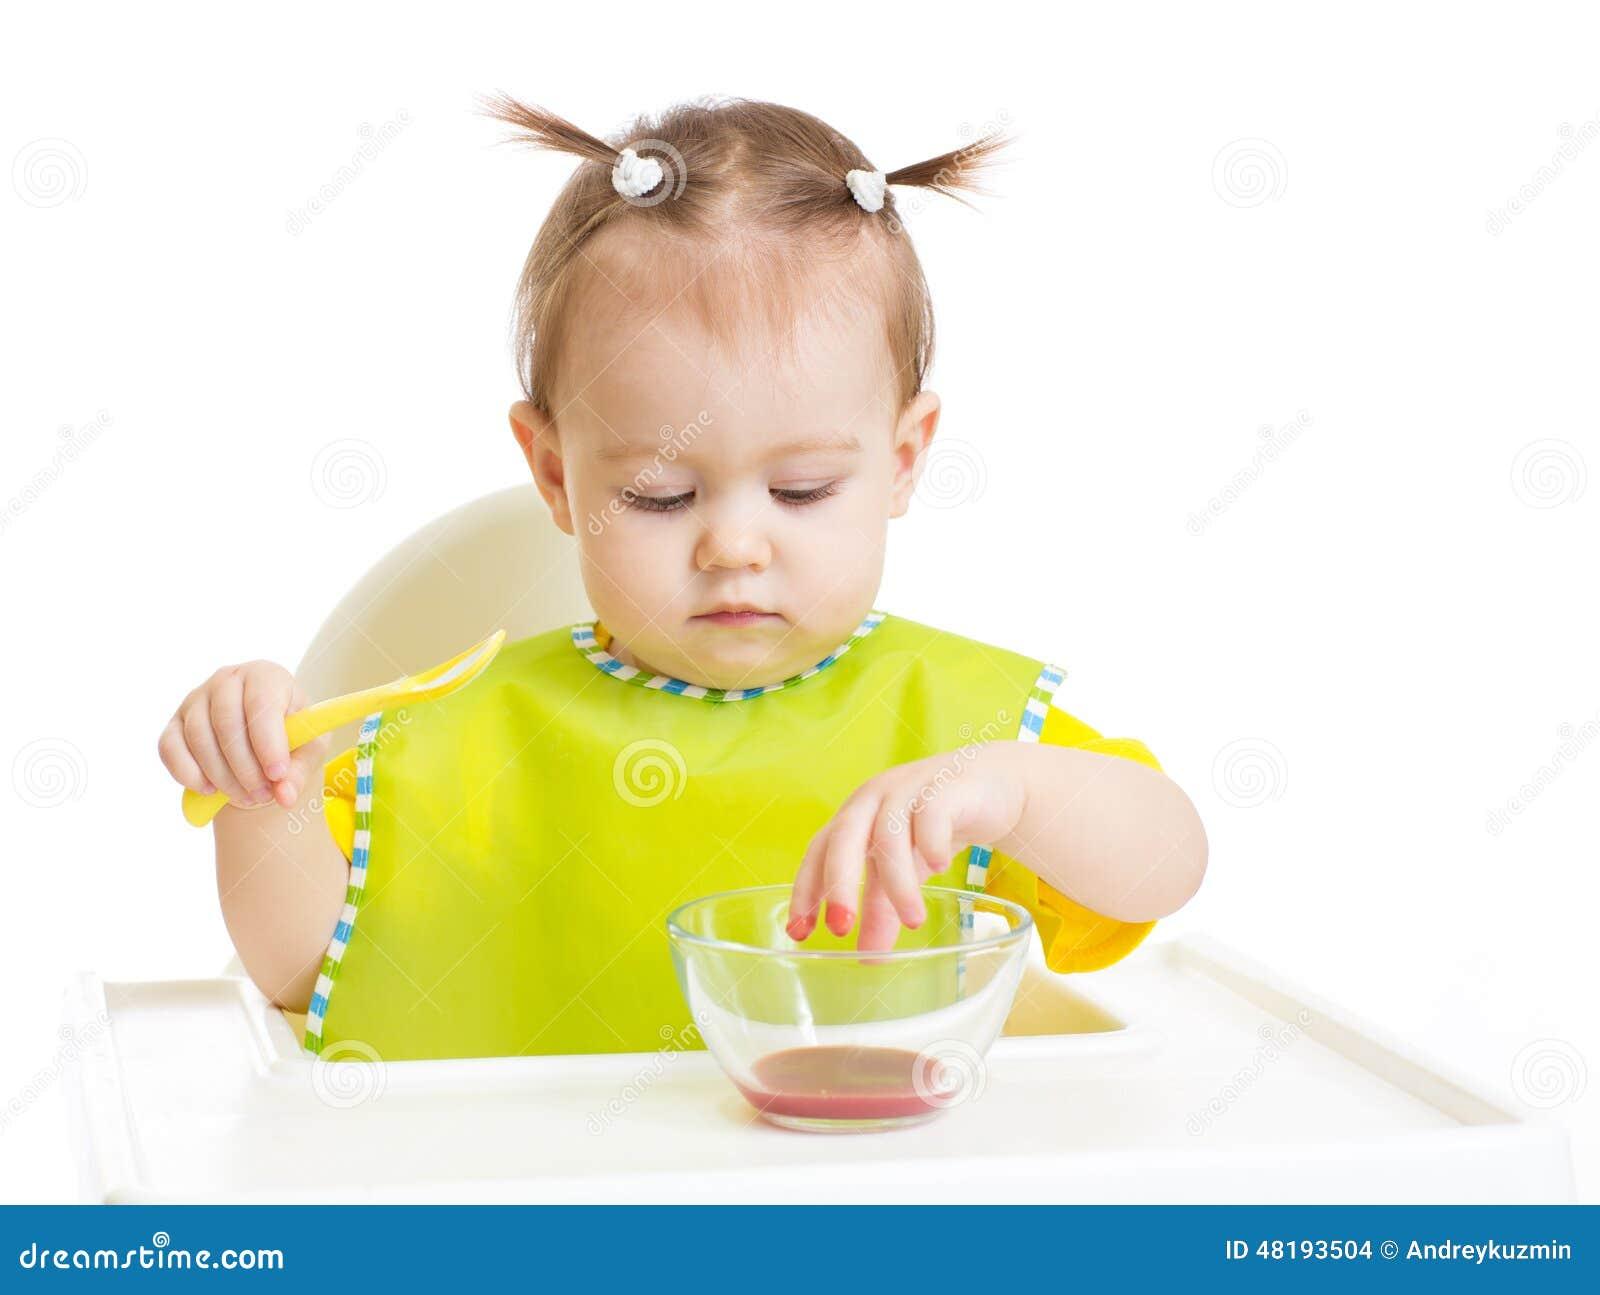 Еда младенца и положенные пальцы в еду сидя на